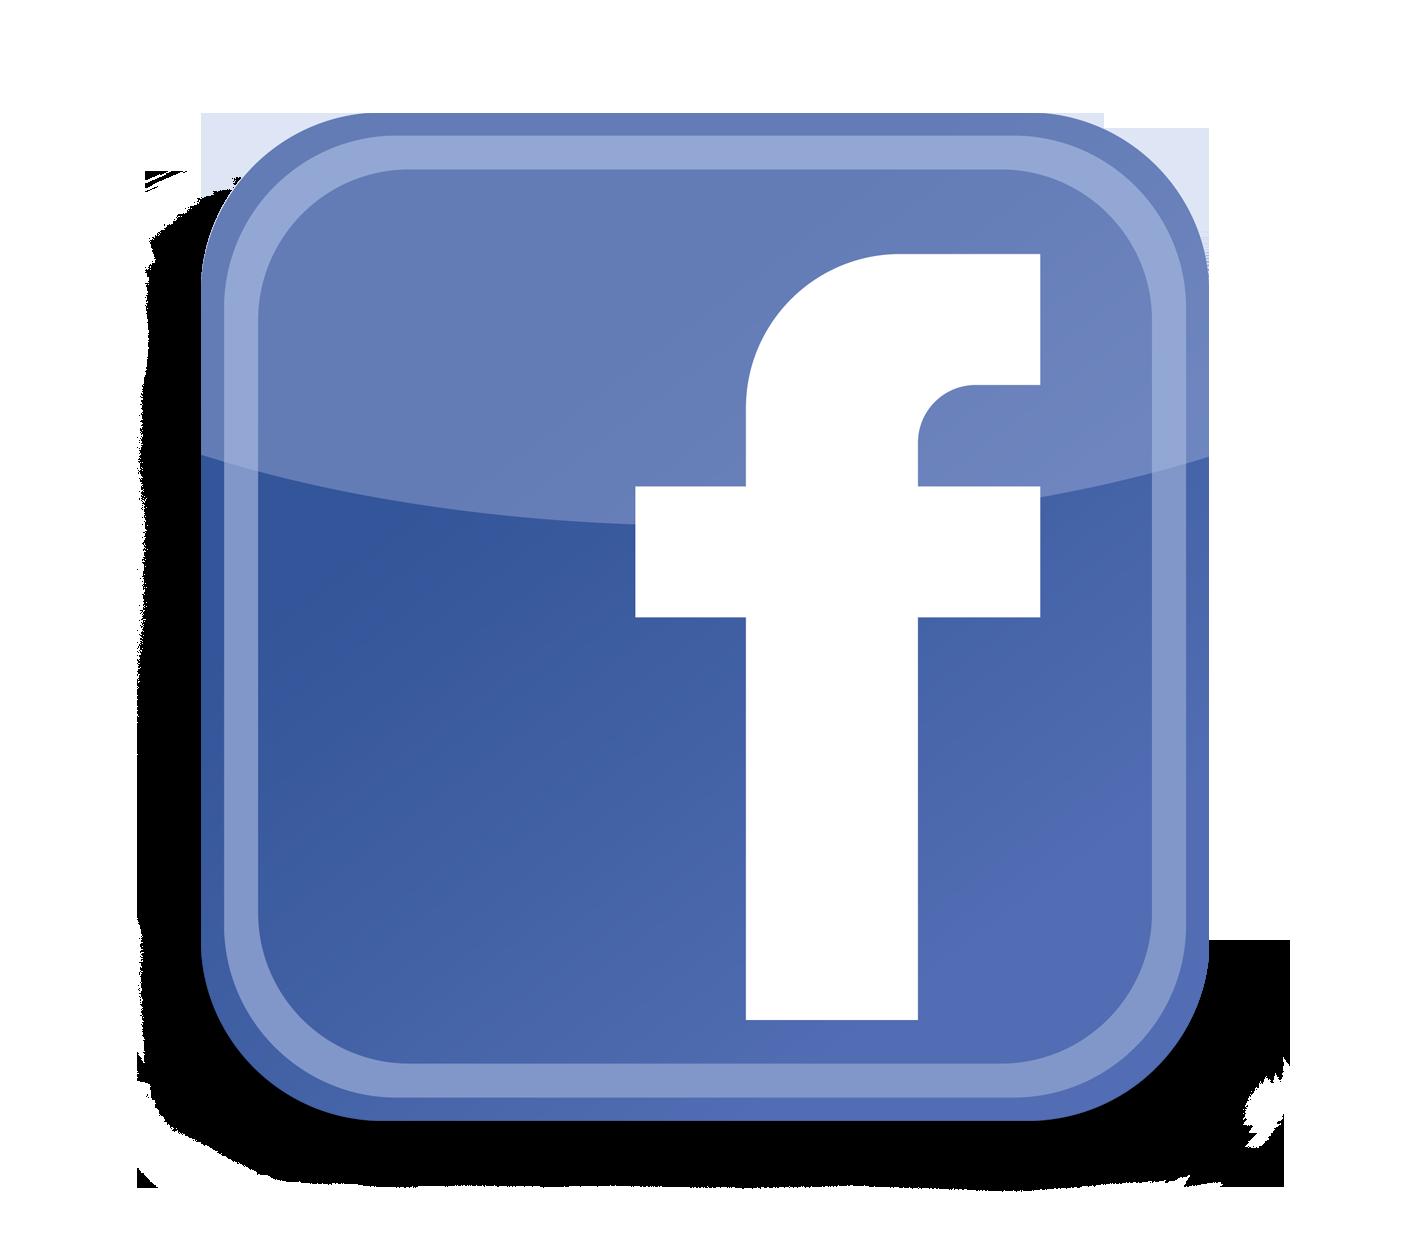 facebook-logo-png-2335.png